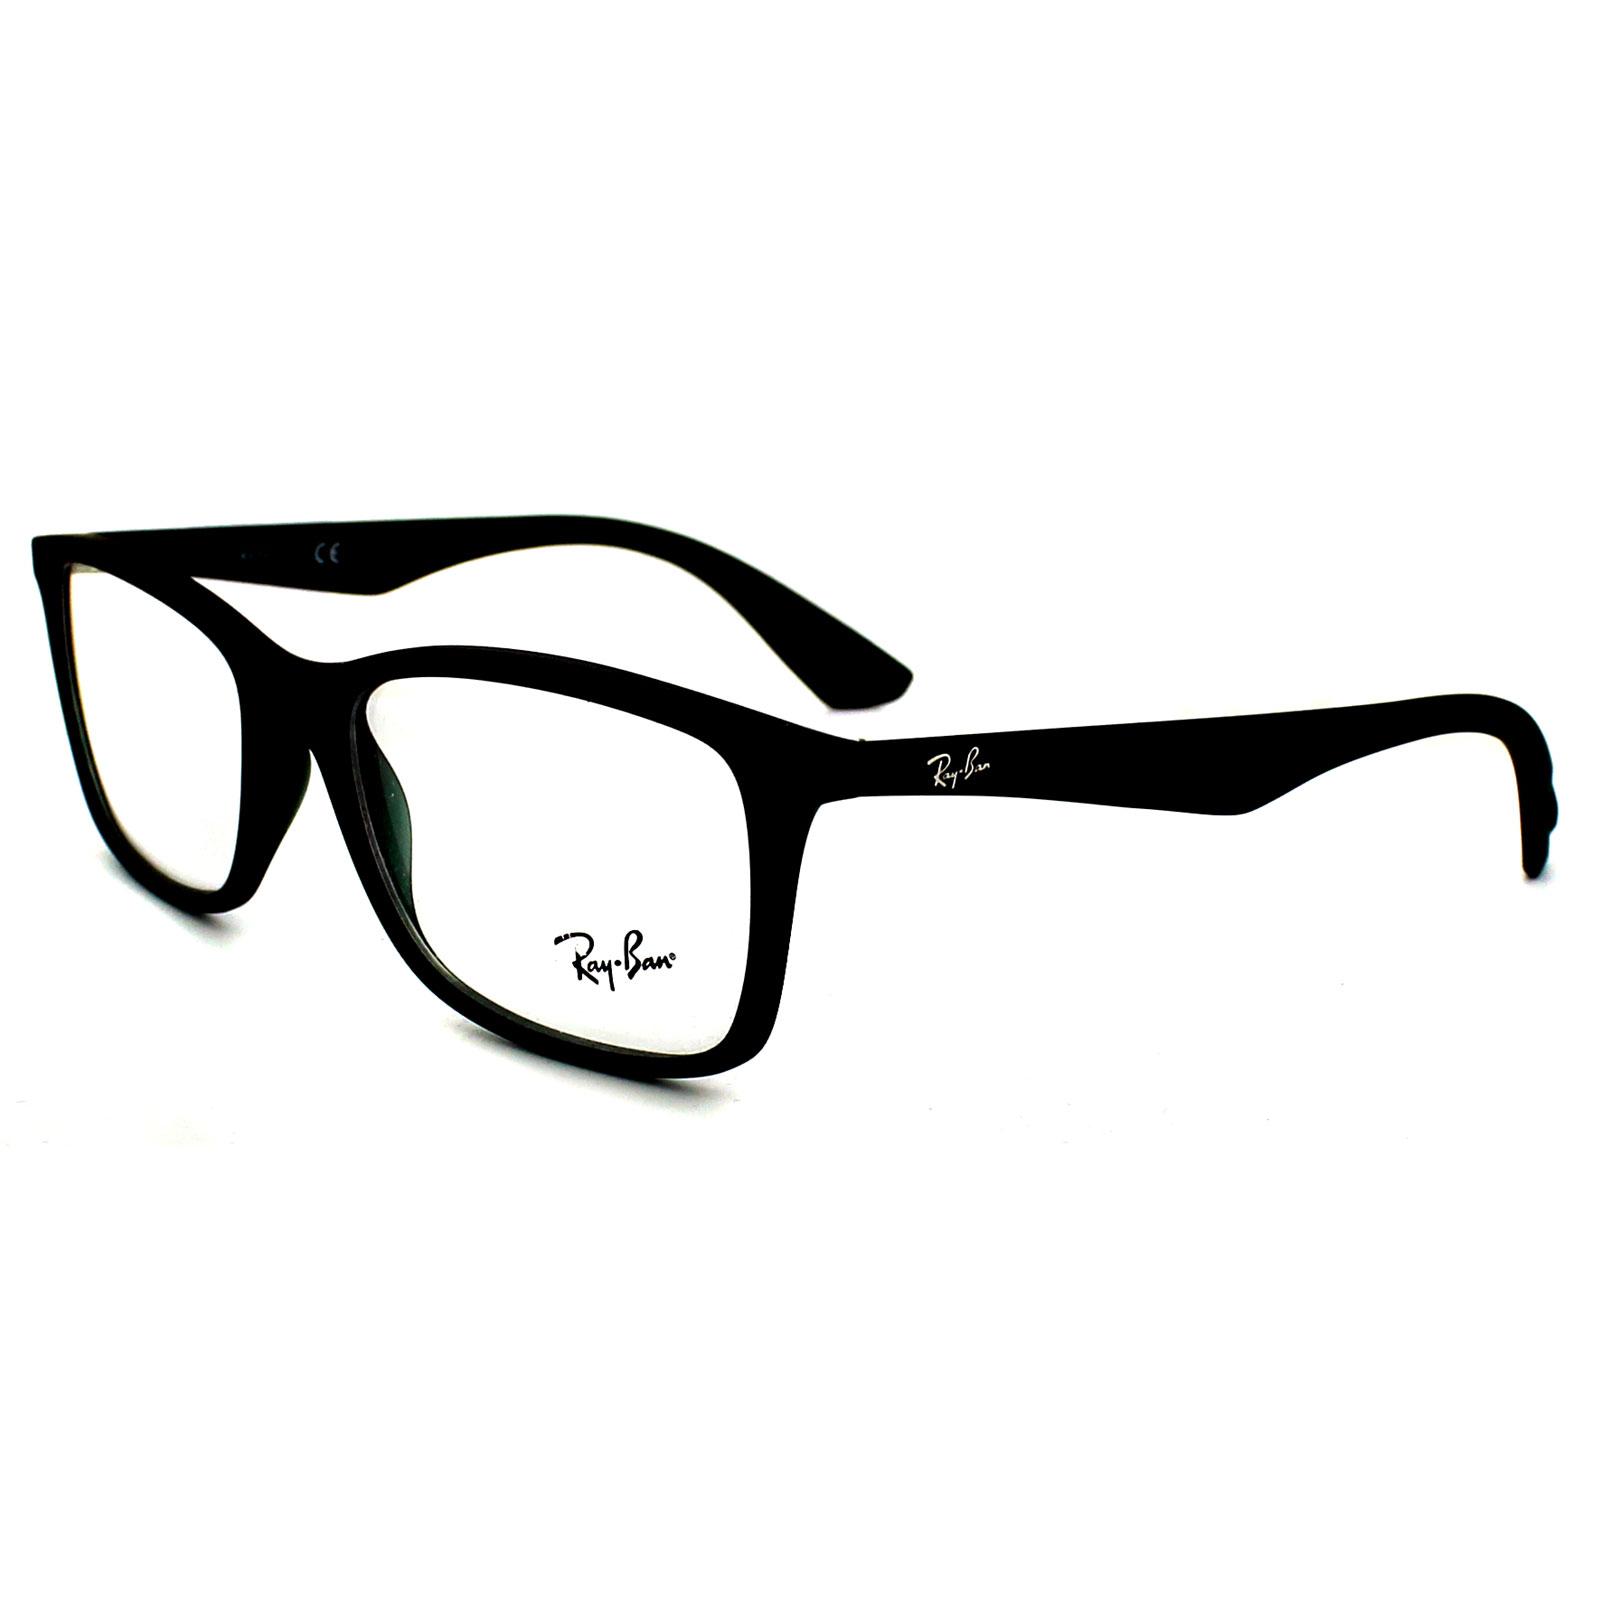 Ray Ban Glasses Frames Matt Amp Transparent Green